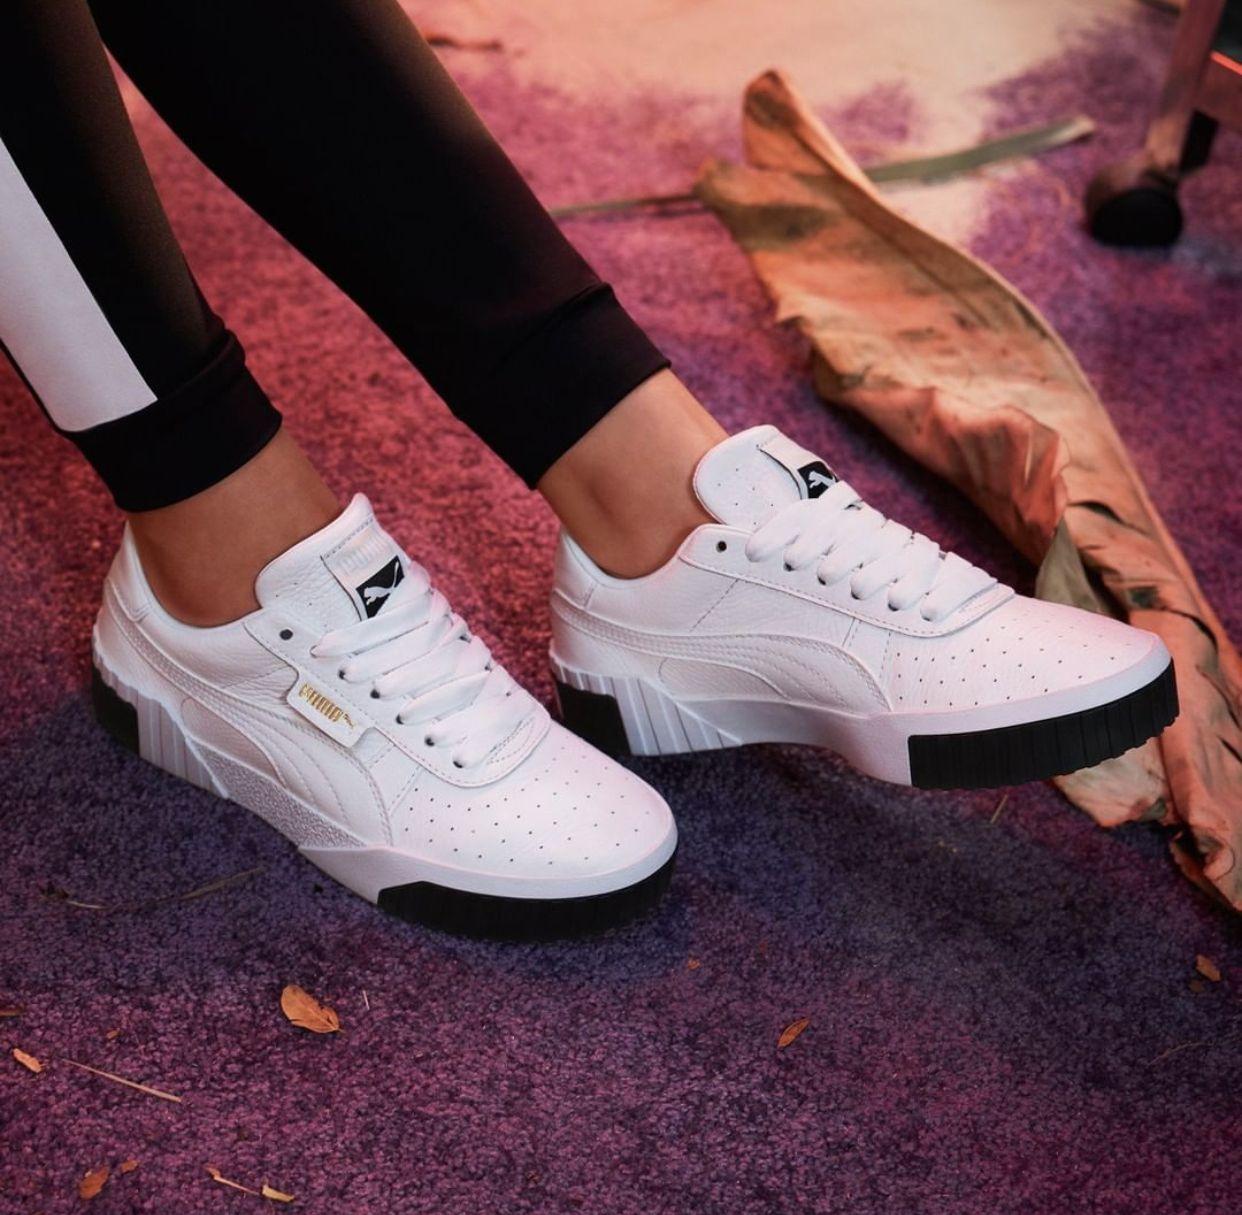 Pin by Bianca Jean-Gilles on Kicks (Sneakers)   White puma ...